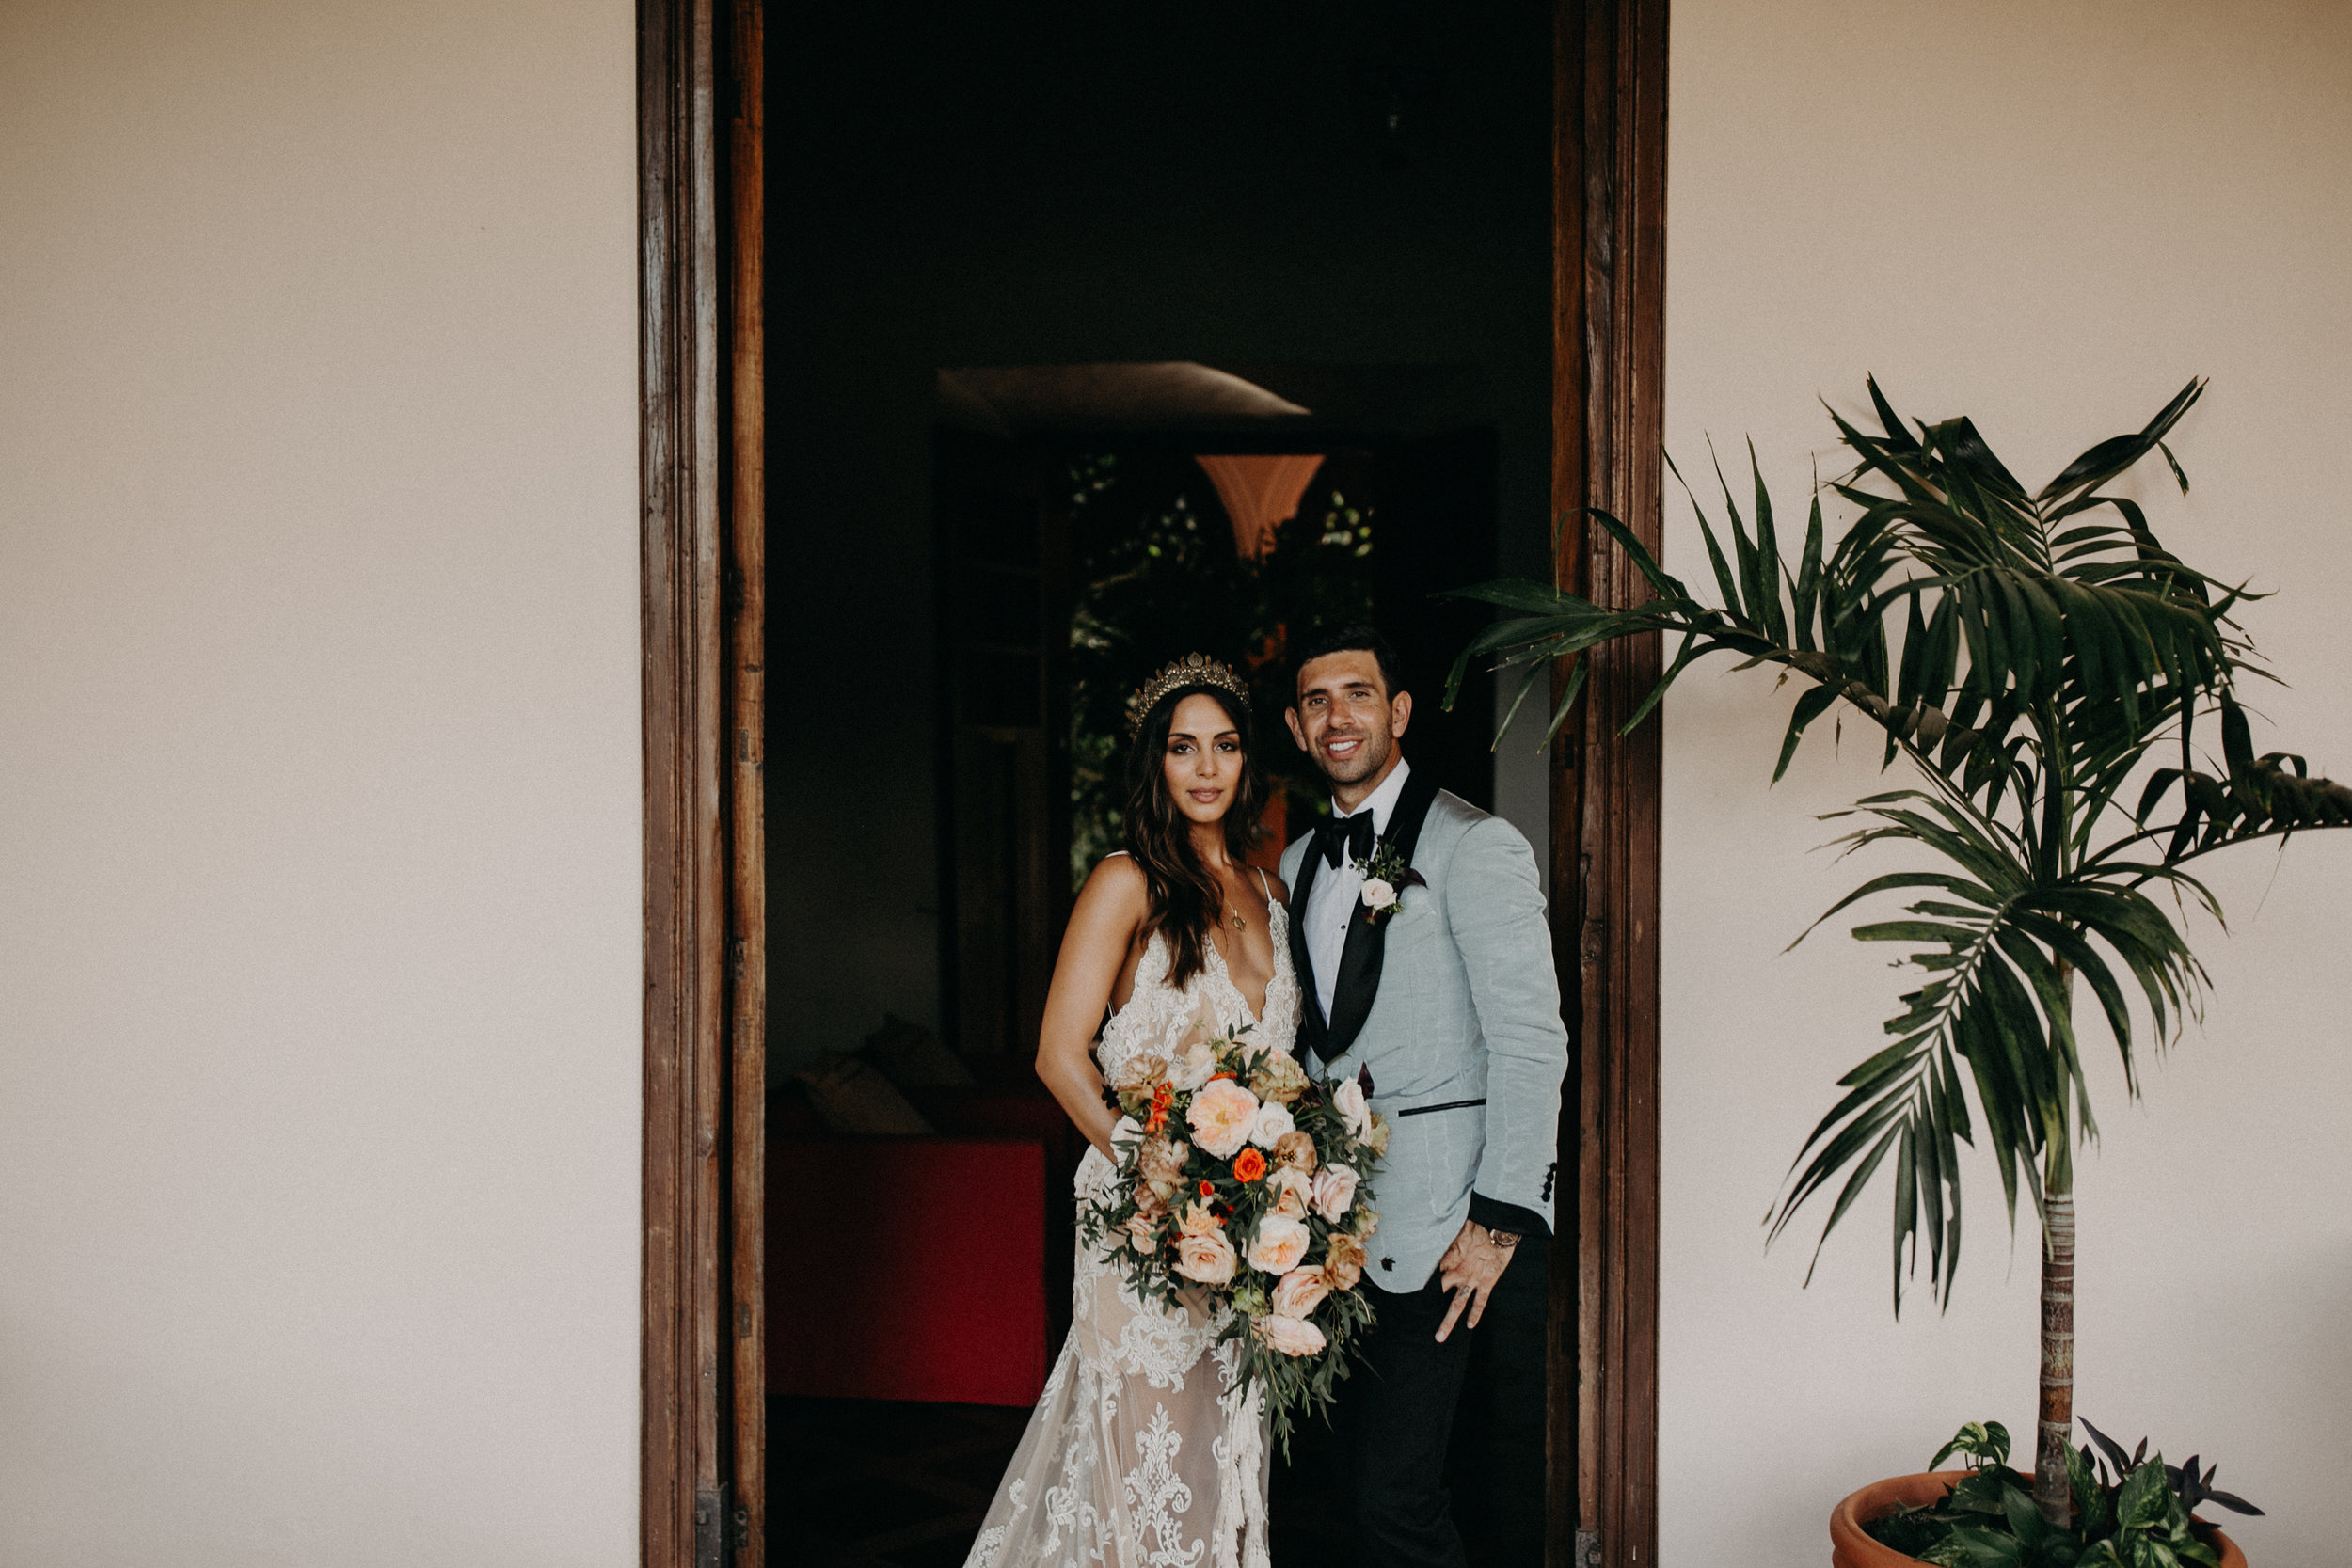 Hacienda Temozon Yucatan Mexico Wedding | Ida & Peter Emily Magers Photography-761.jpg